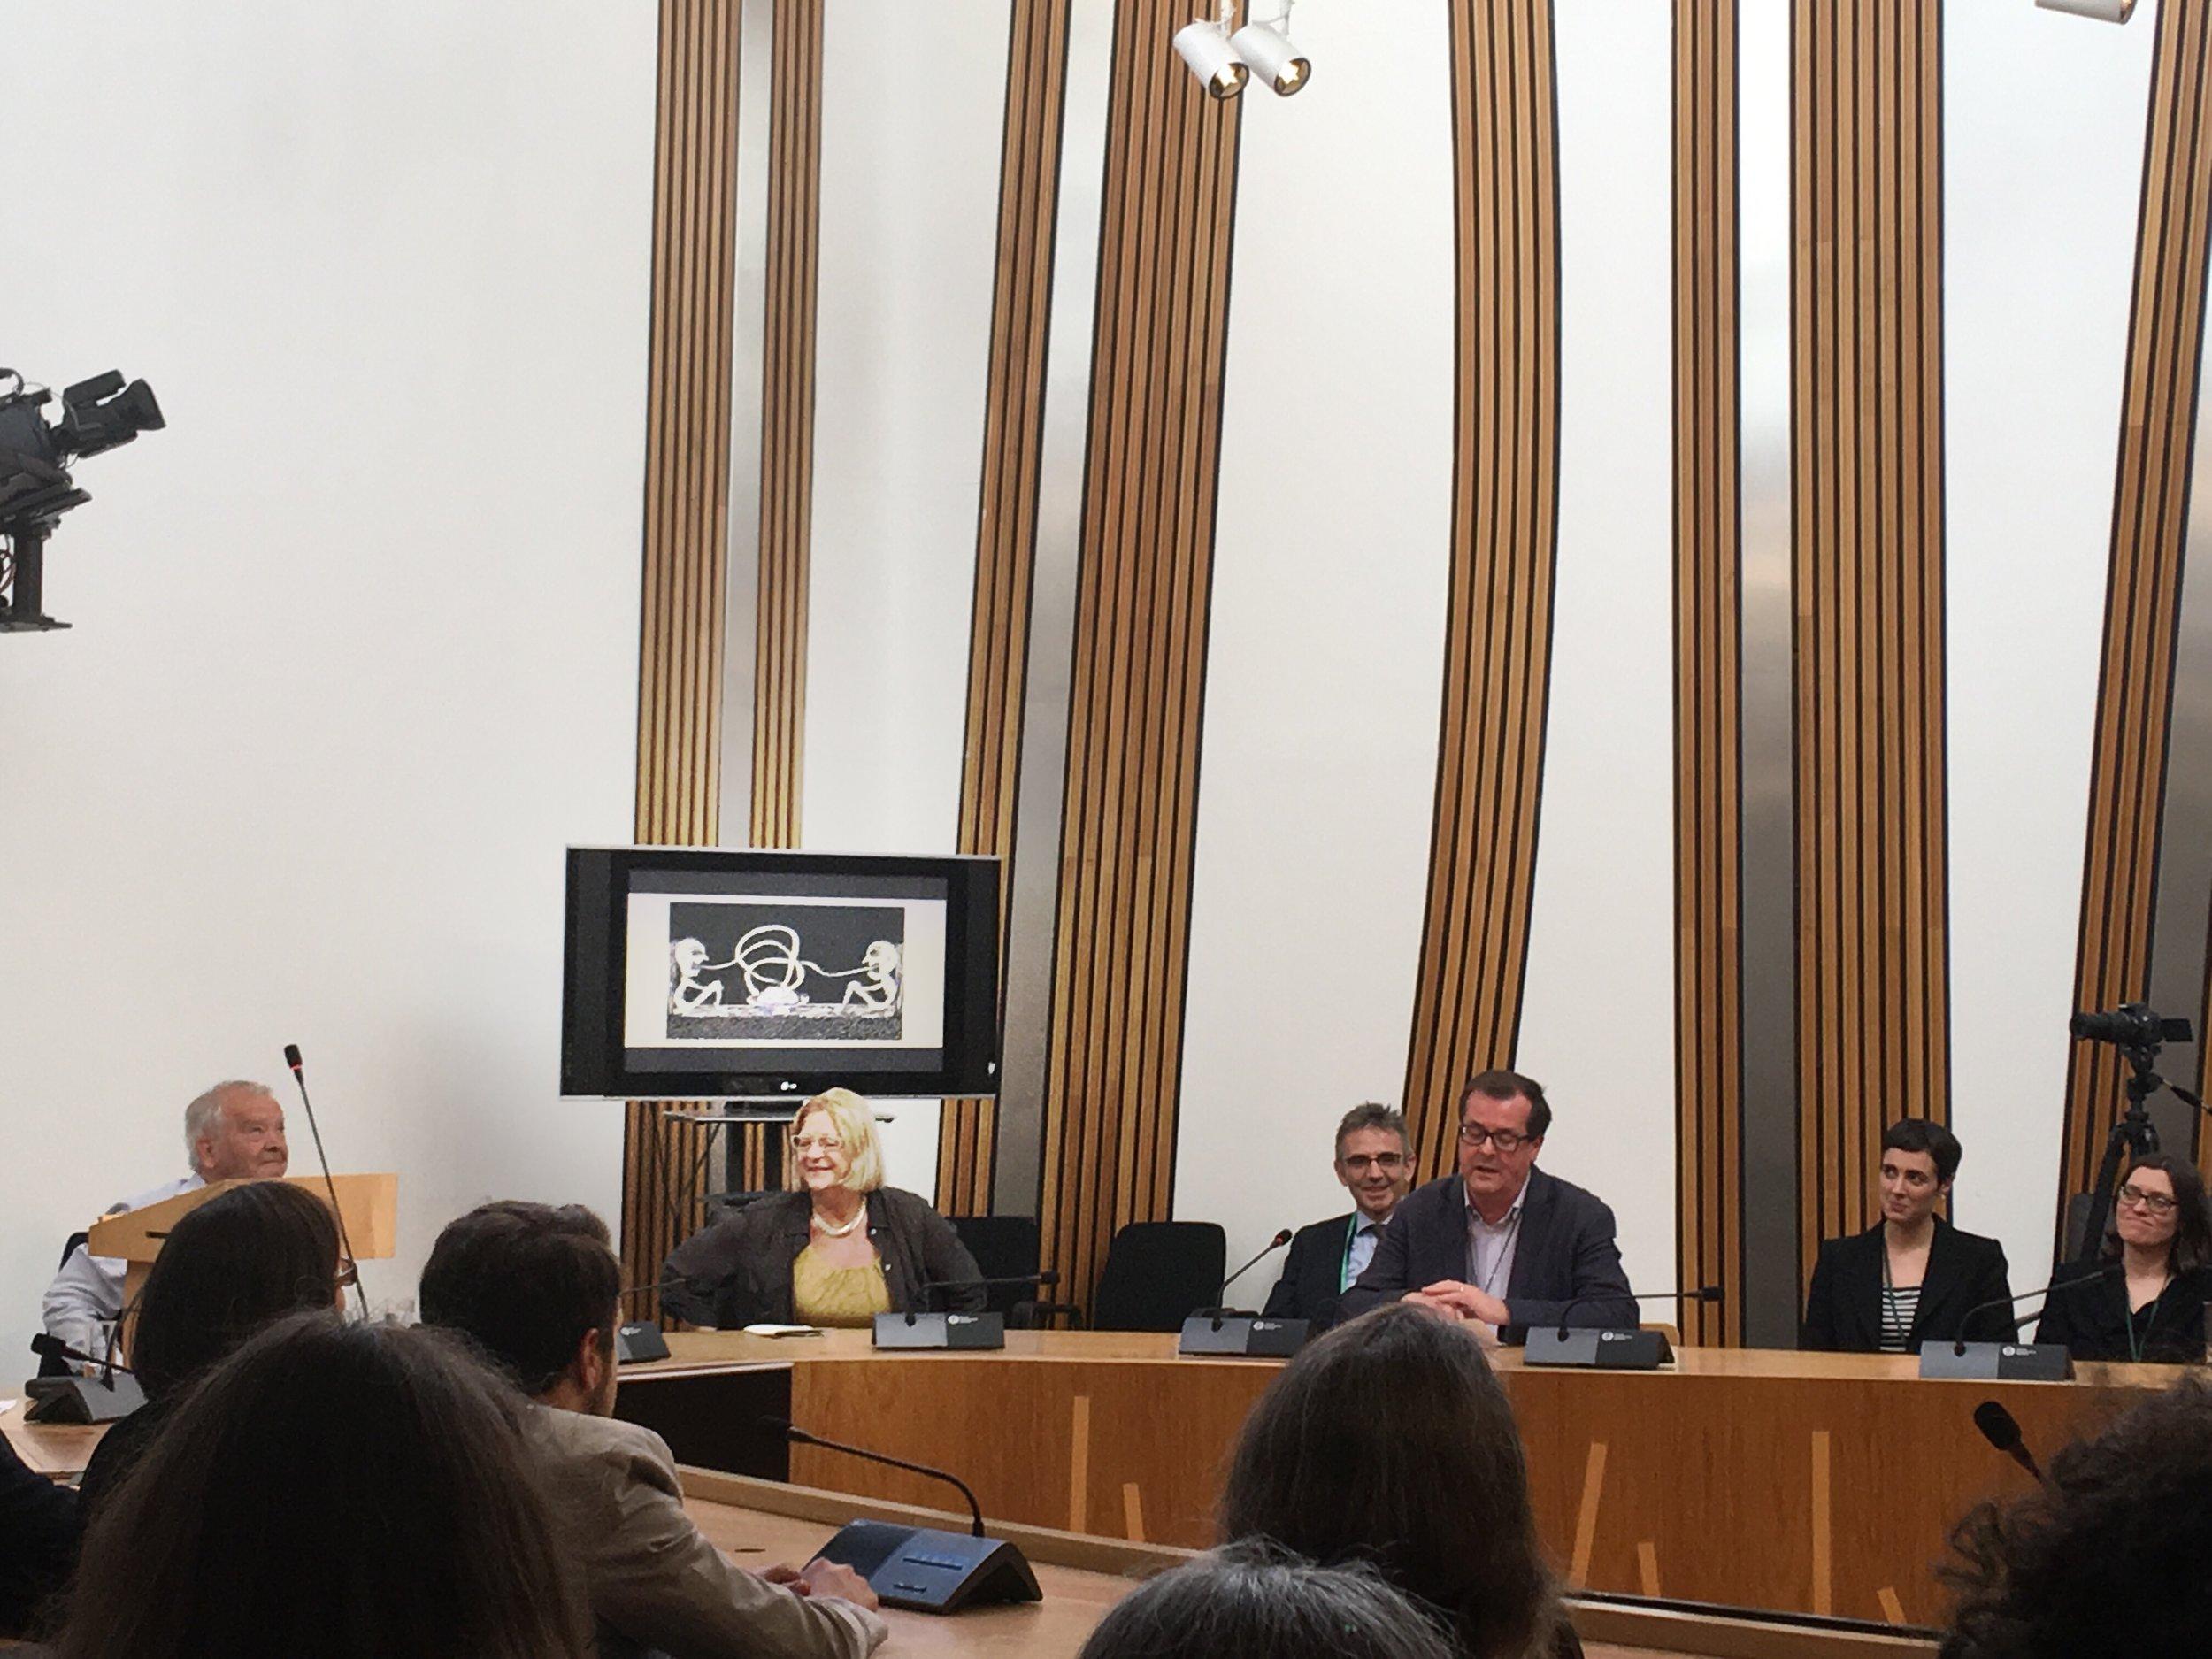 Exhibition + Curation  WW1 Scottish Parliament + the University of Edinburgh, 2017